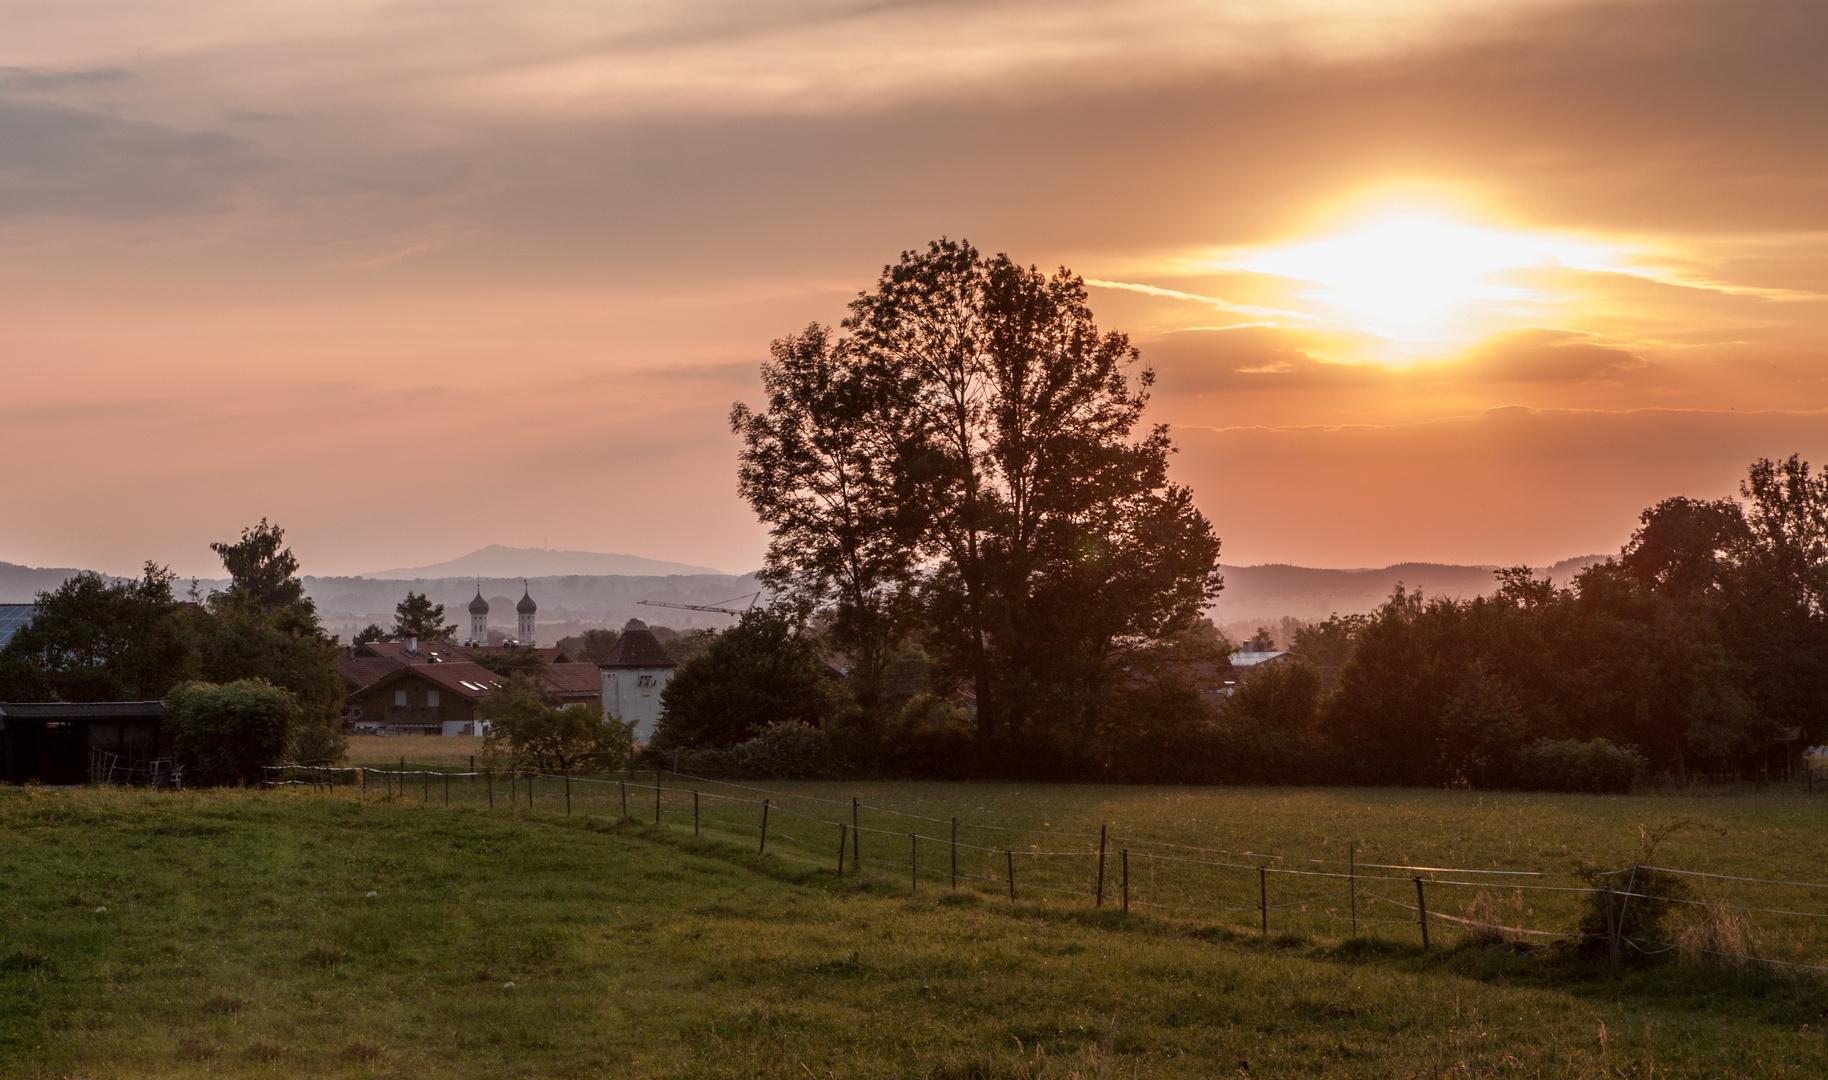 Benediktbeuern im Sonnenuntergang